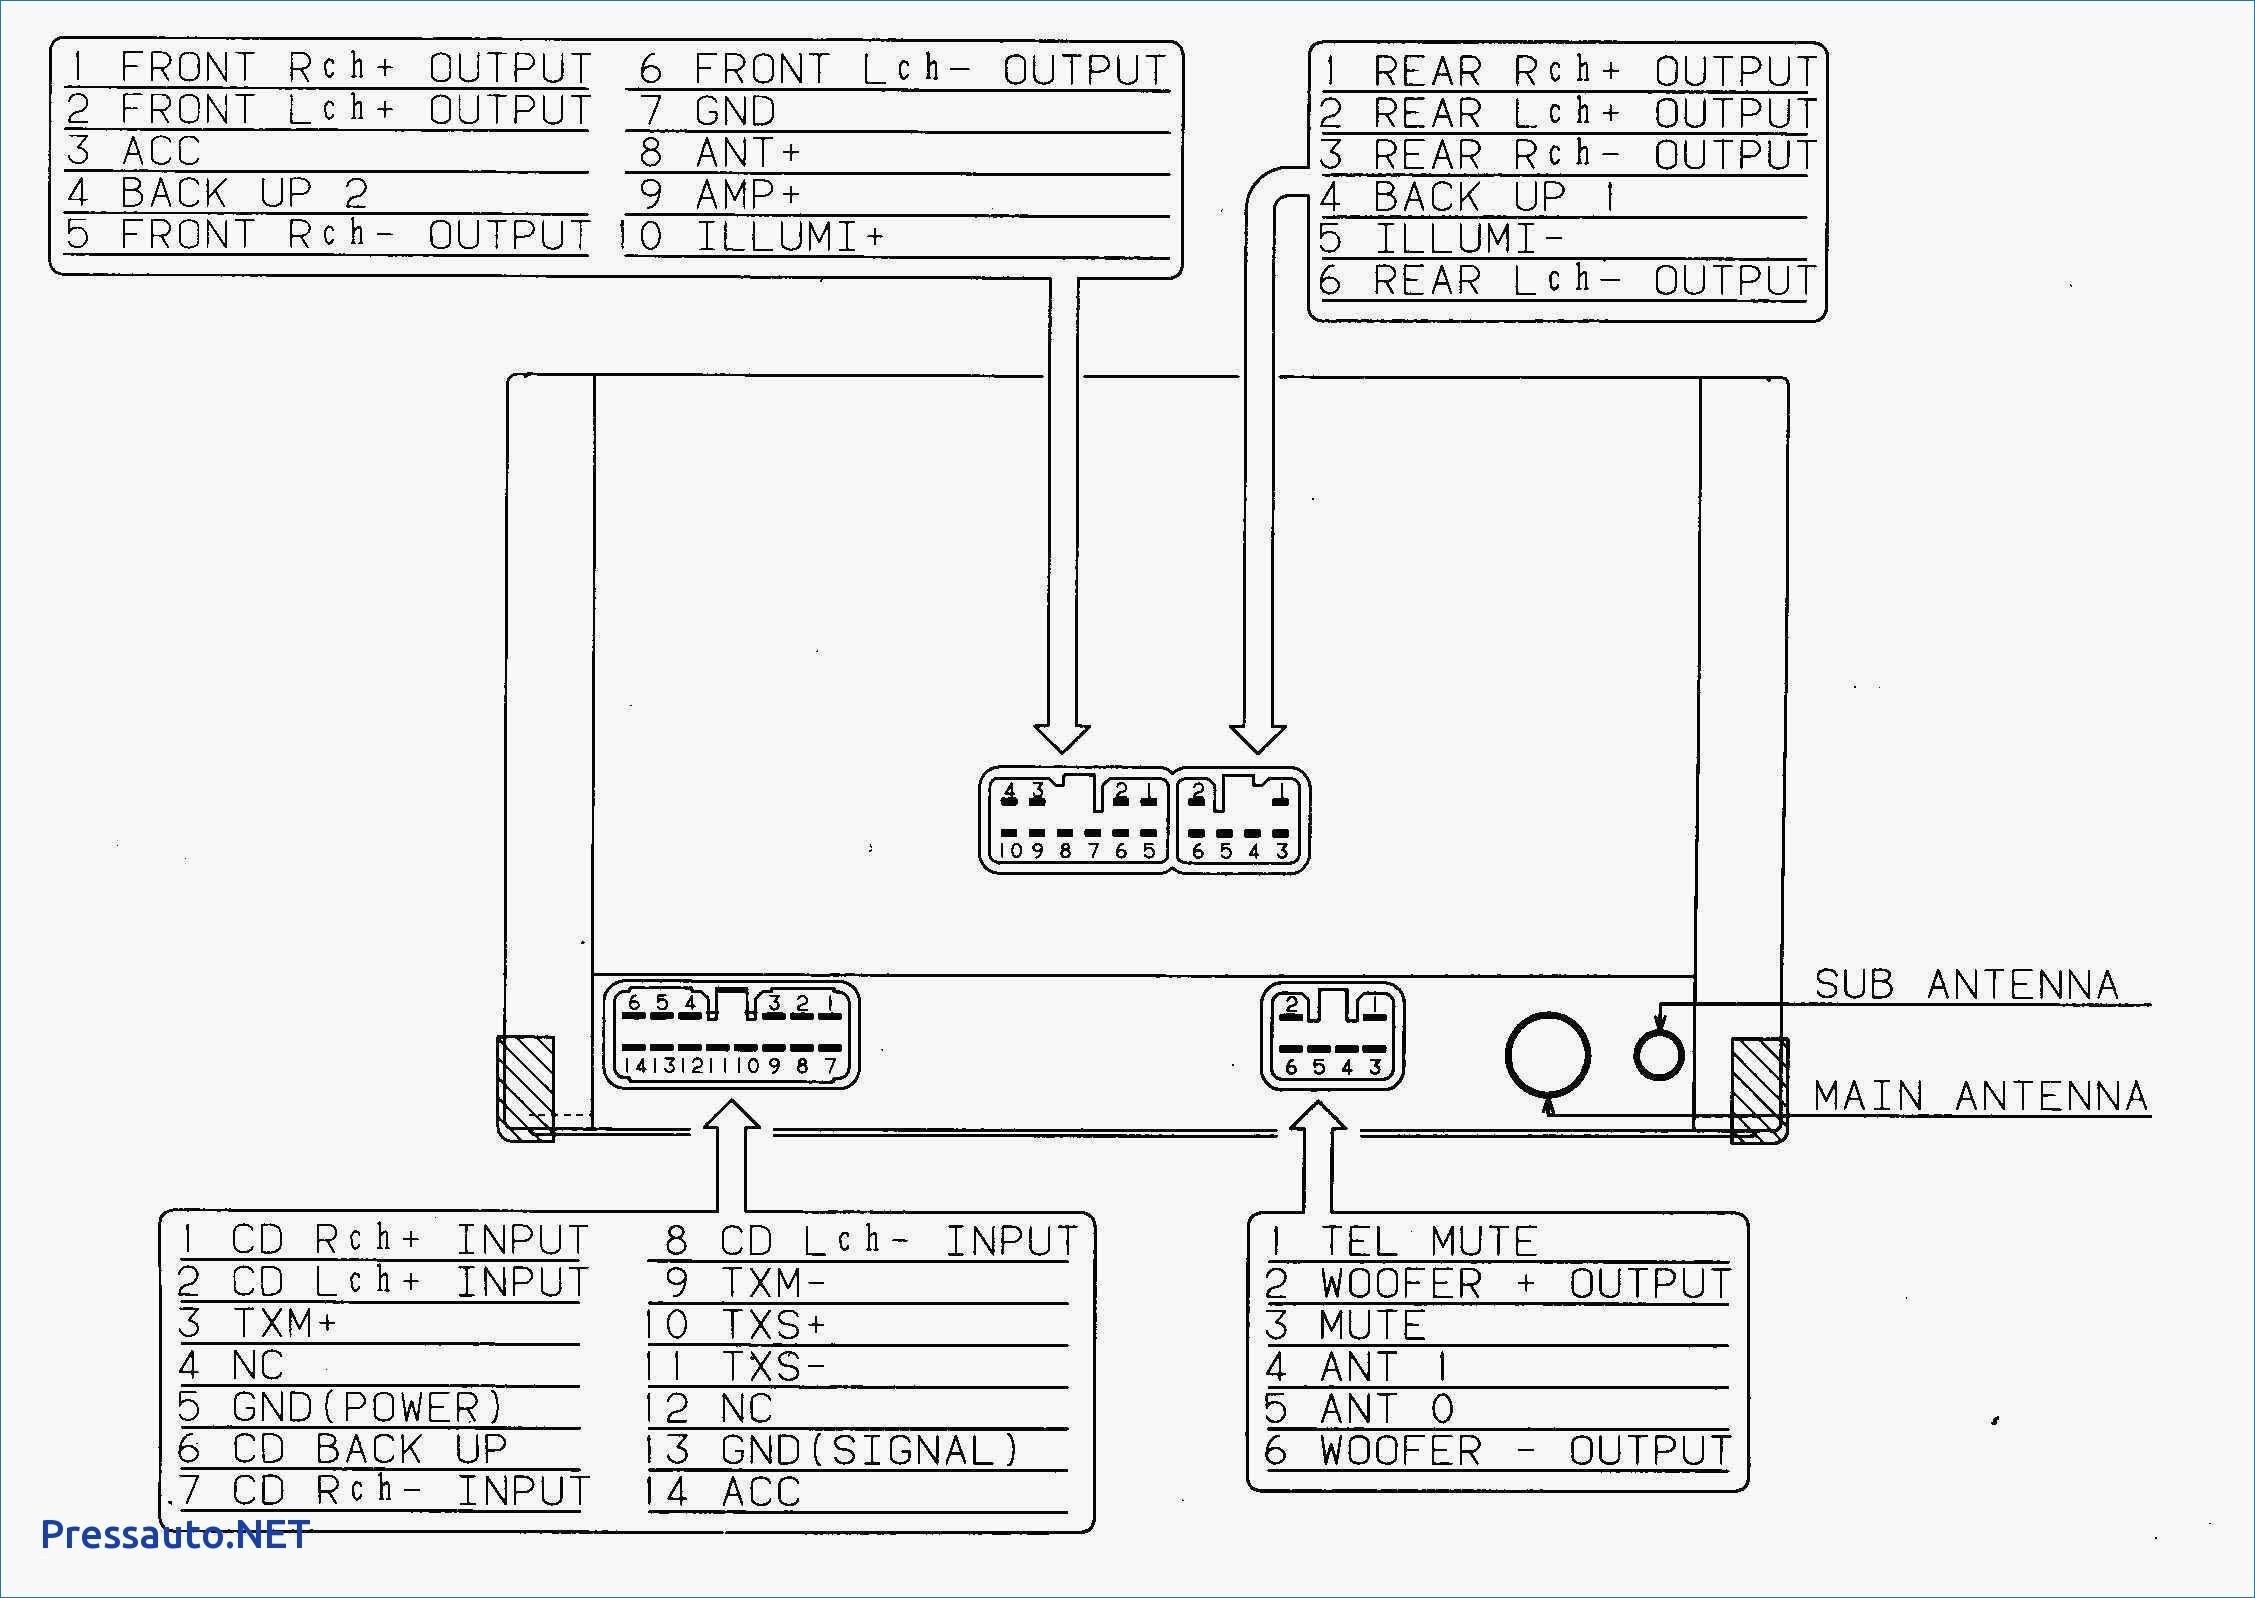 Car Deck Wiring Diagram Car Stereo Wiring Diagram originalstylophone Of Car Deck  Wiring Diagram Pioneer Car